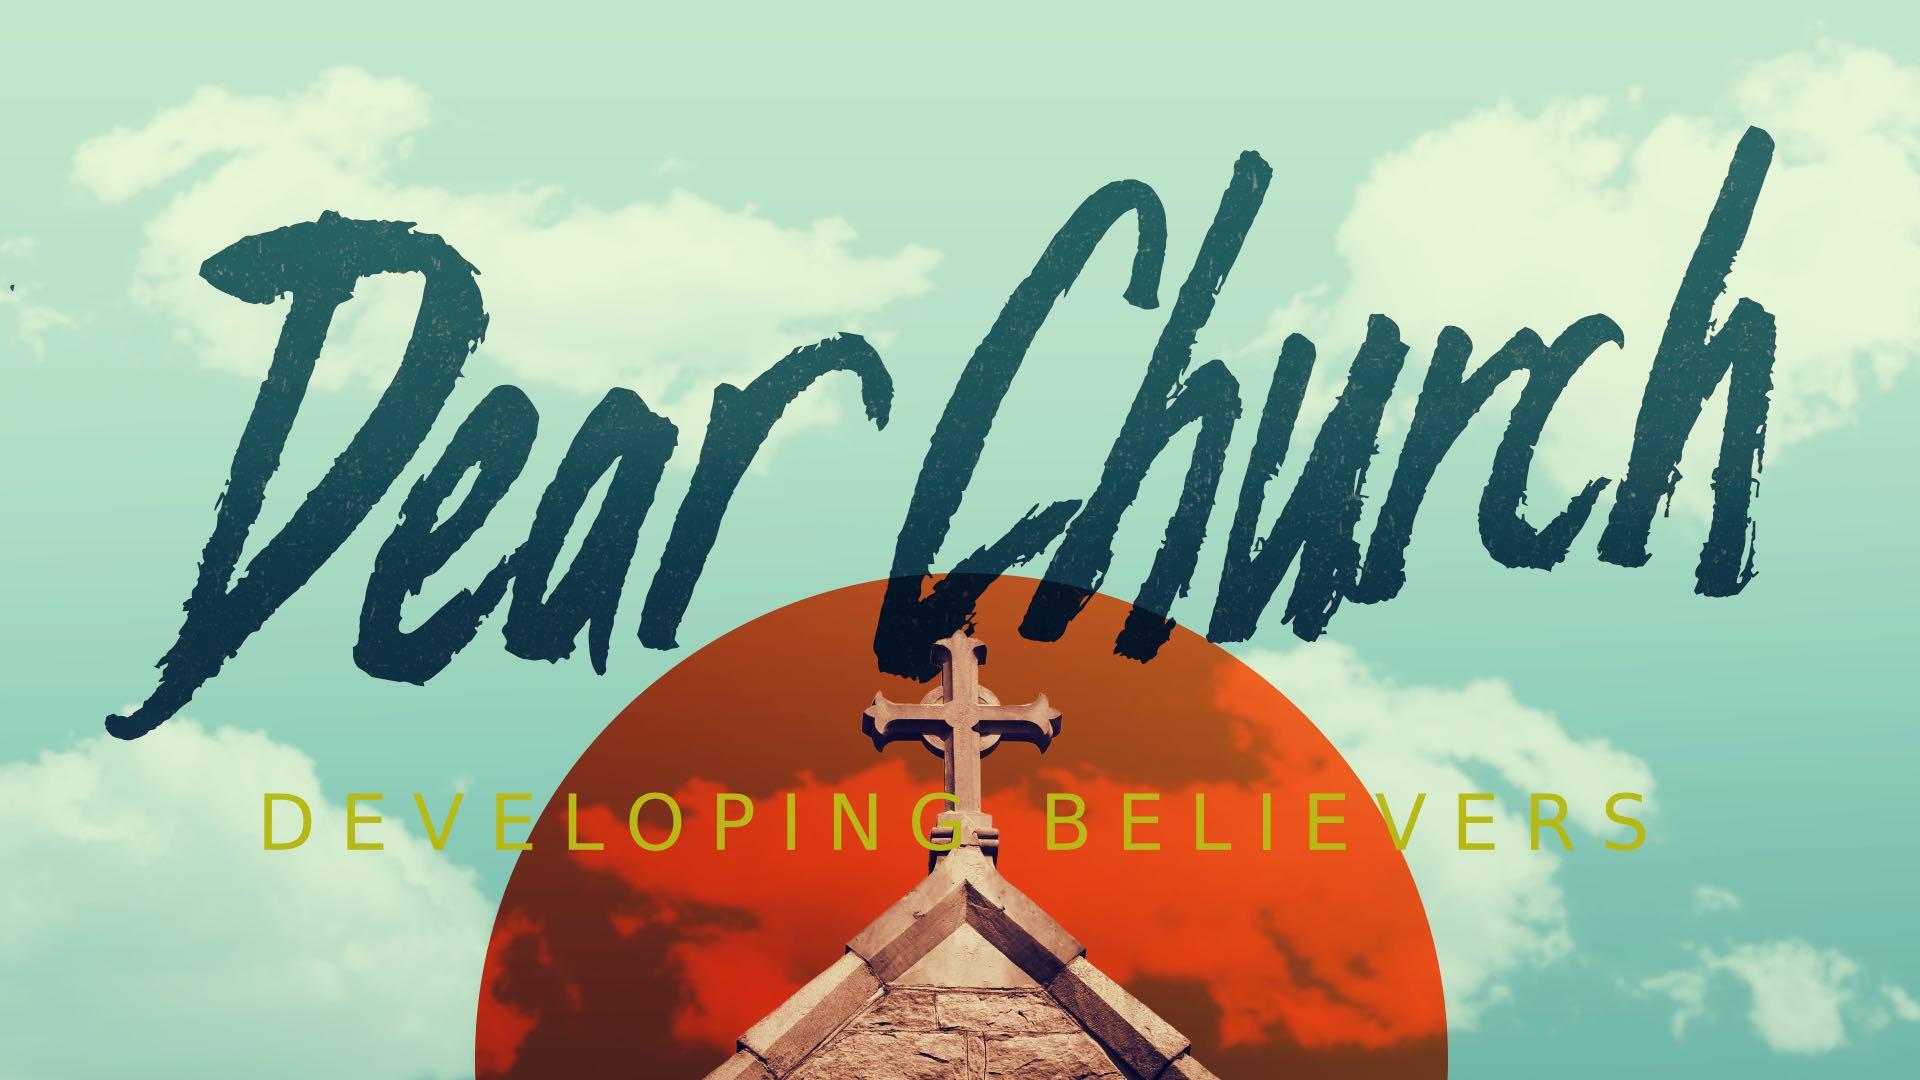 Developing Believers Part 1